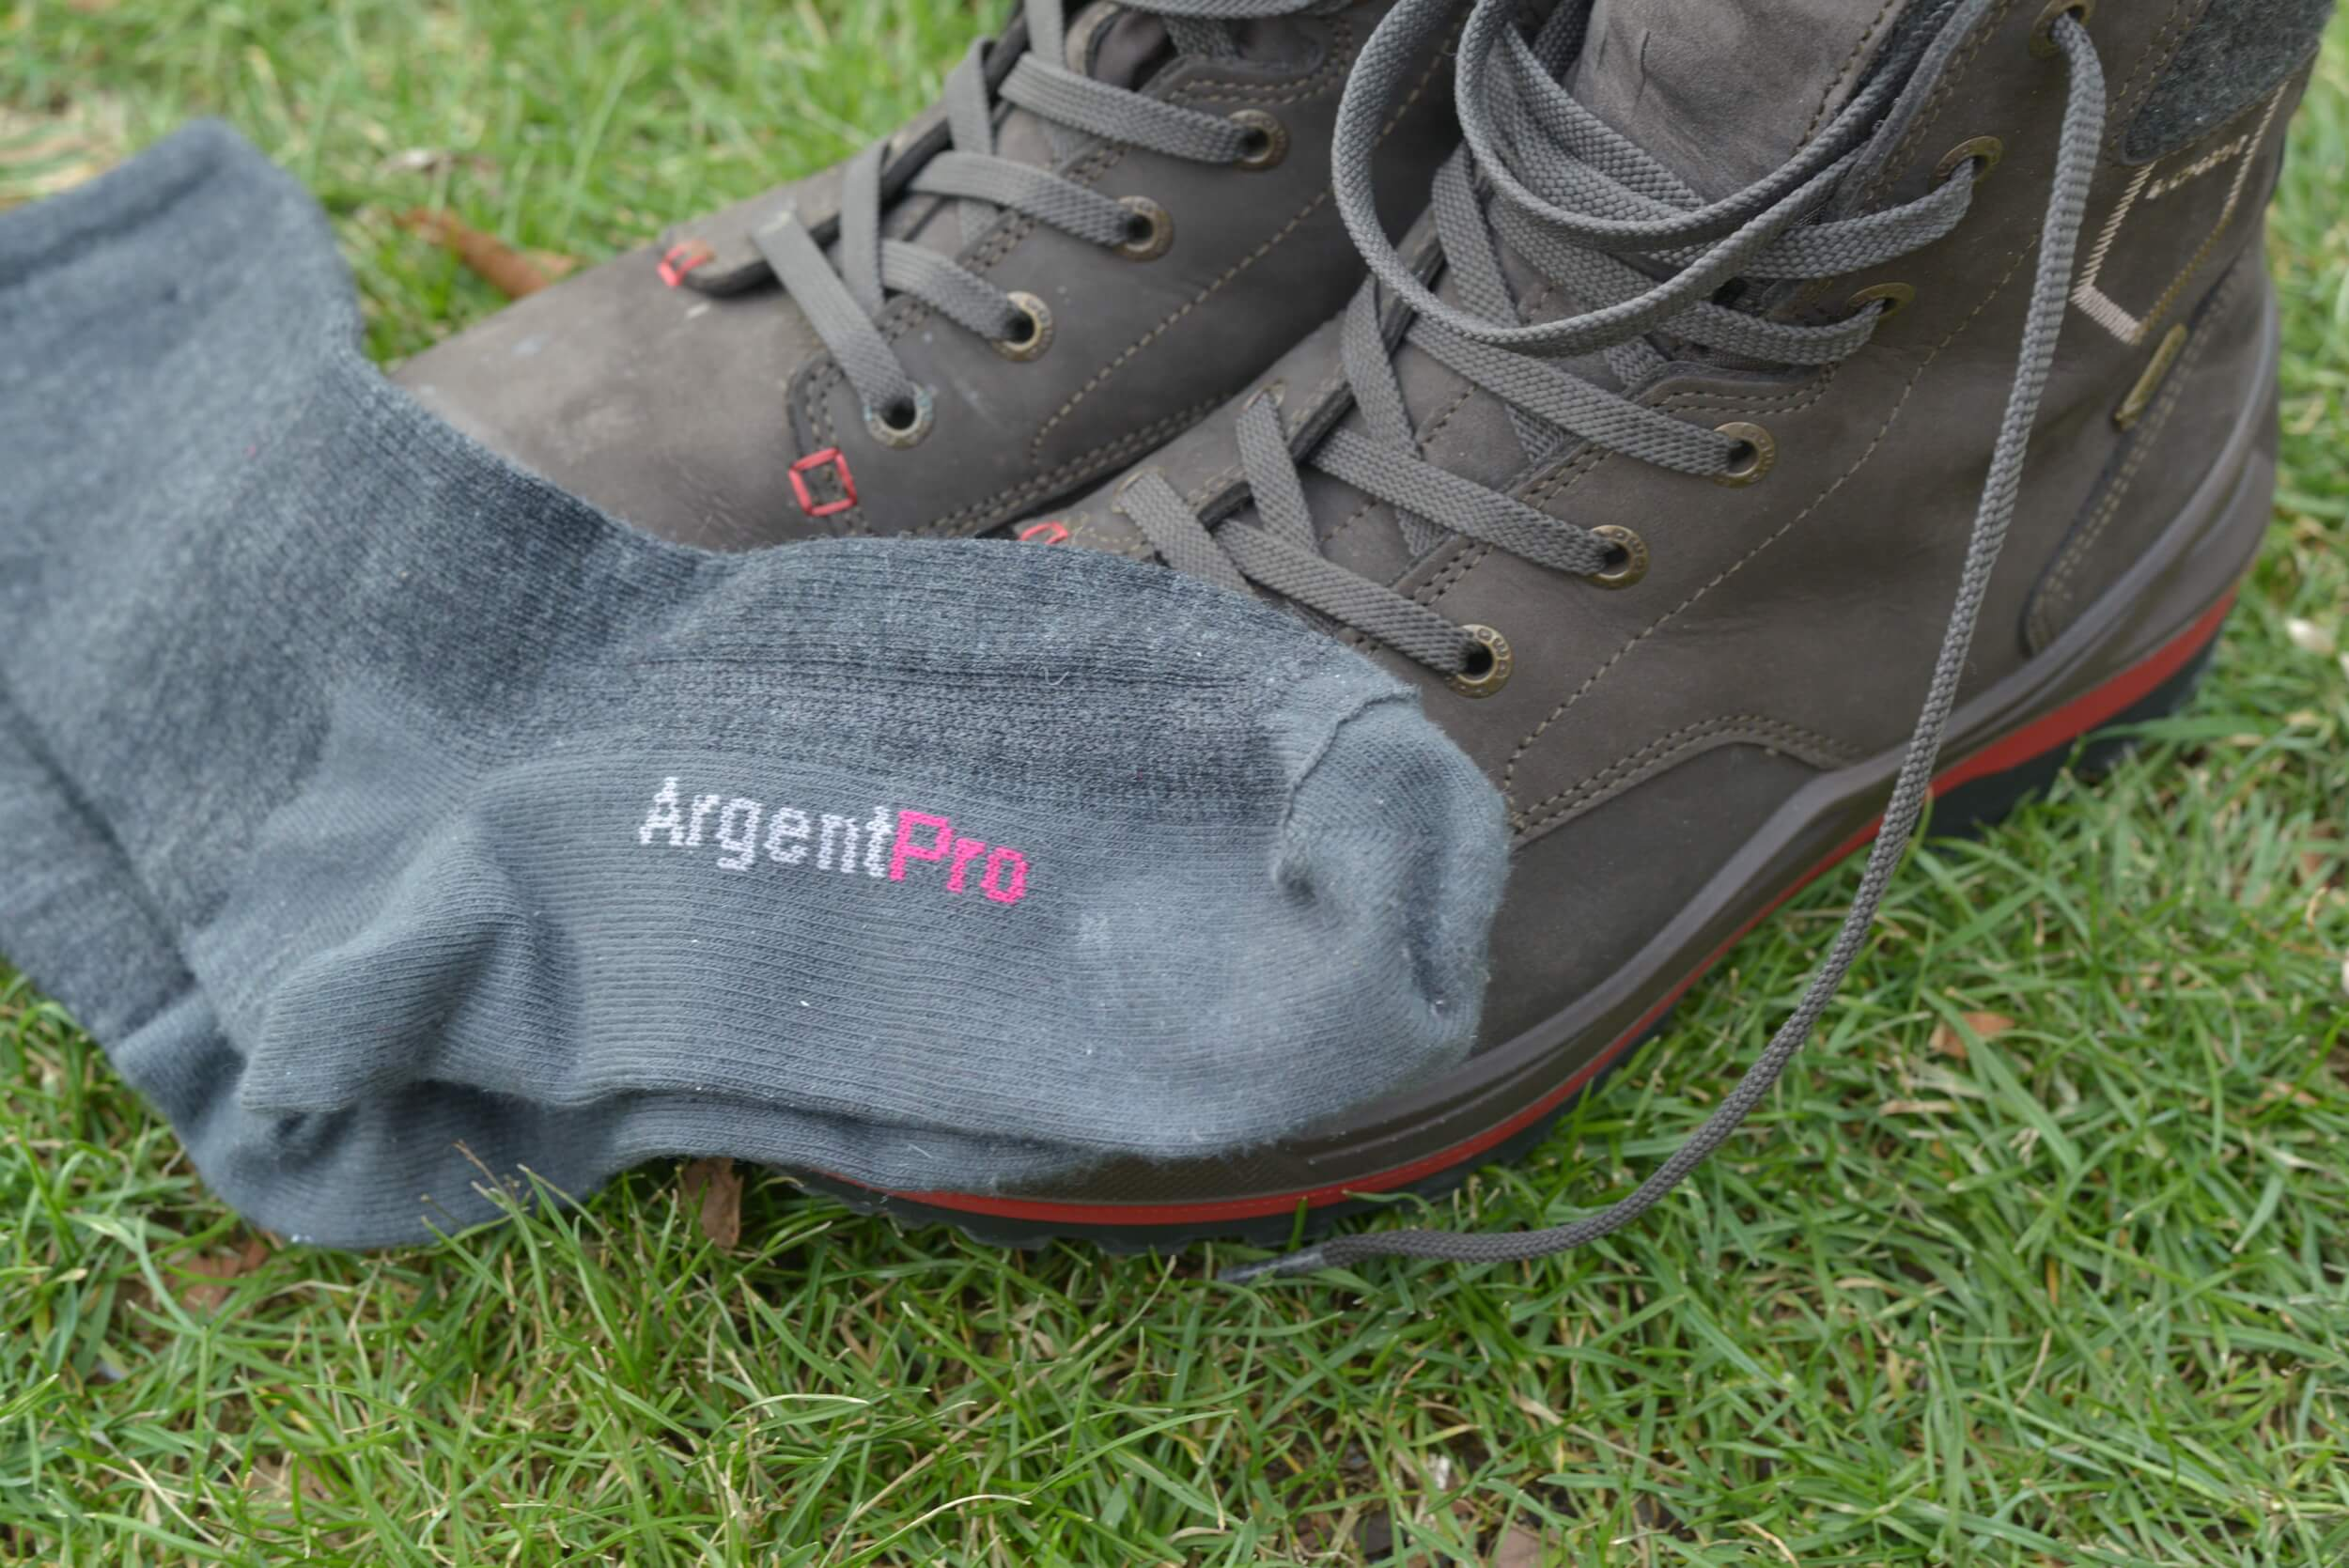 ArgentPro socks review